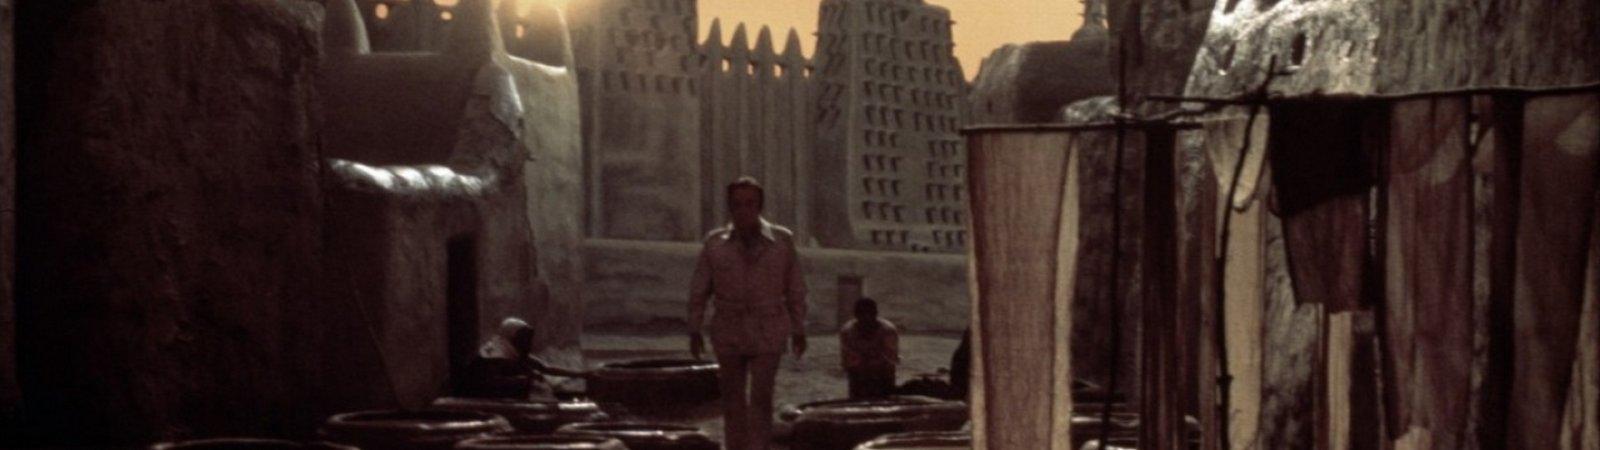 Photo du film : L'exorciste 2